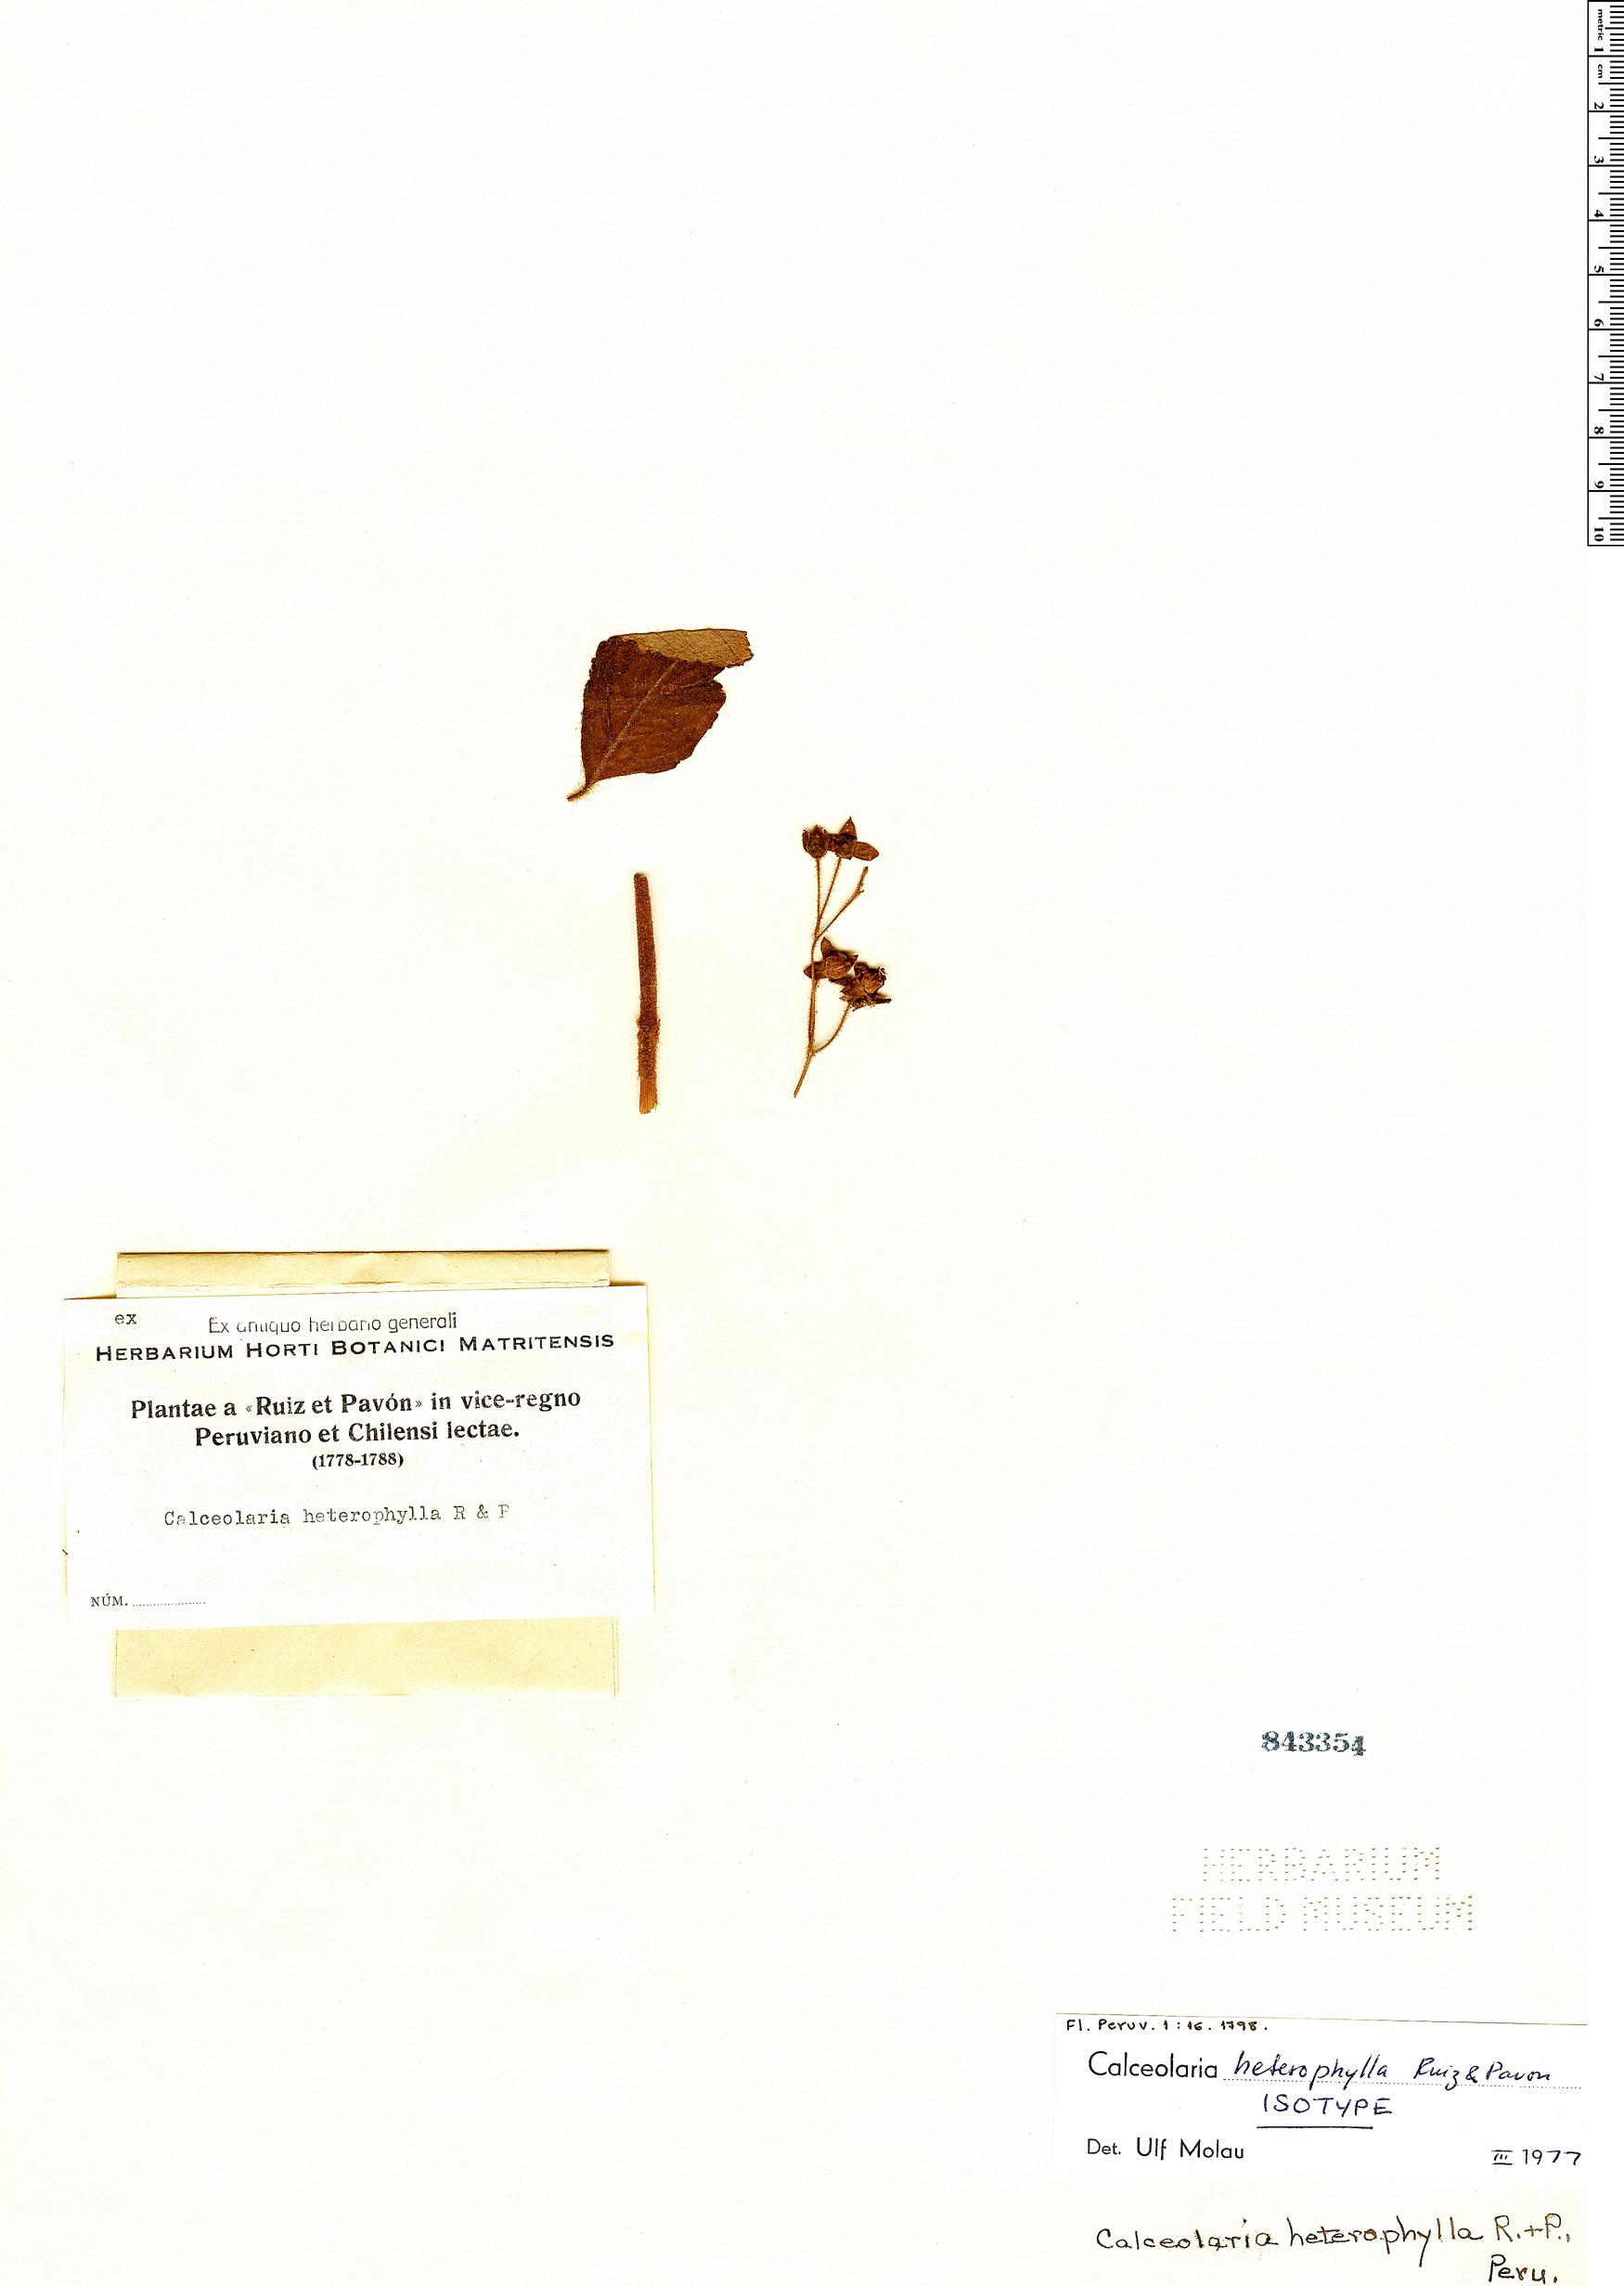 Espécimen: Calceolaria heterophylla